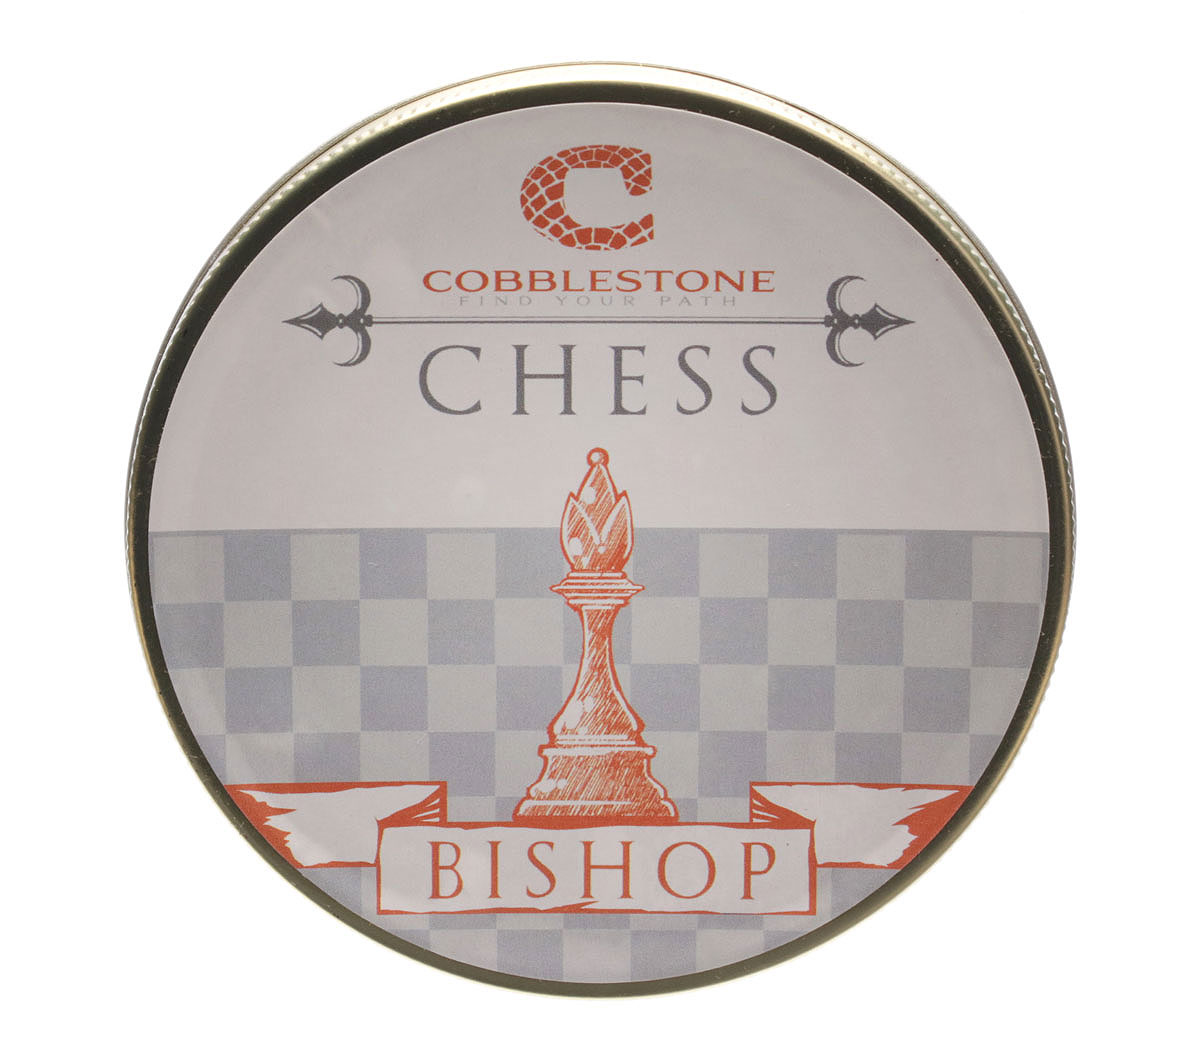 Cobblestone Chess Bishop 1.75oz